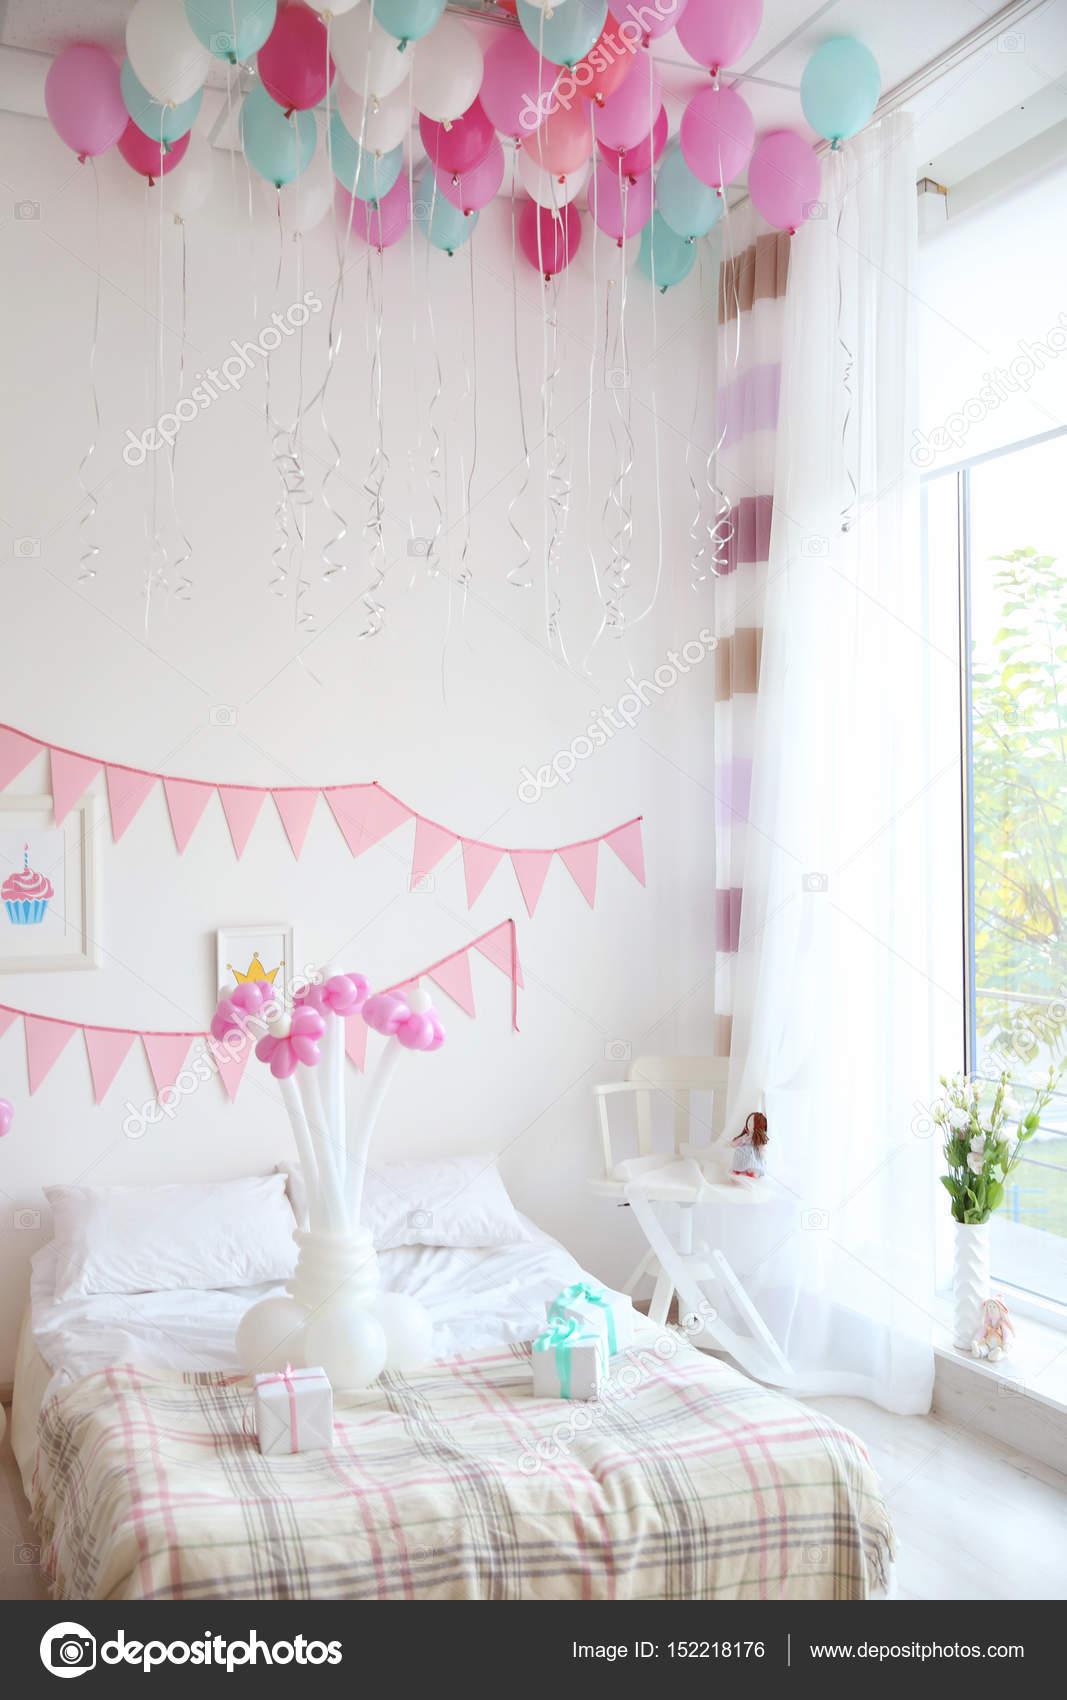 Quarto decorado para festa de anivers rio stock photo for Cuartos decorados para aniversario